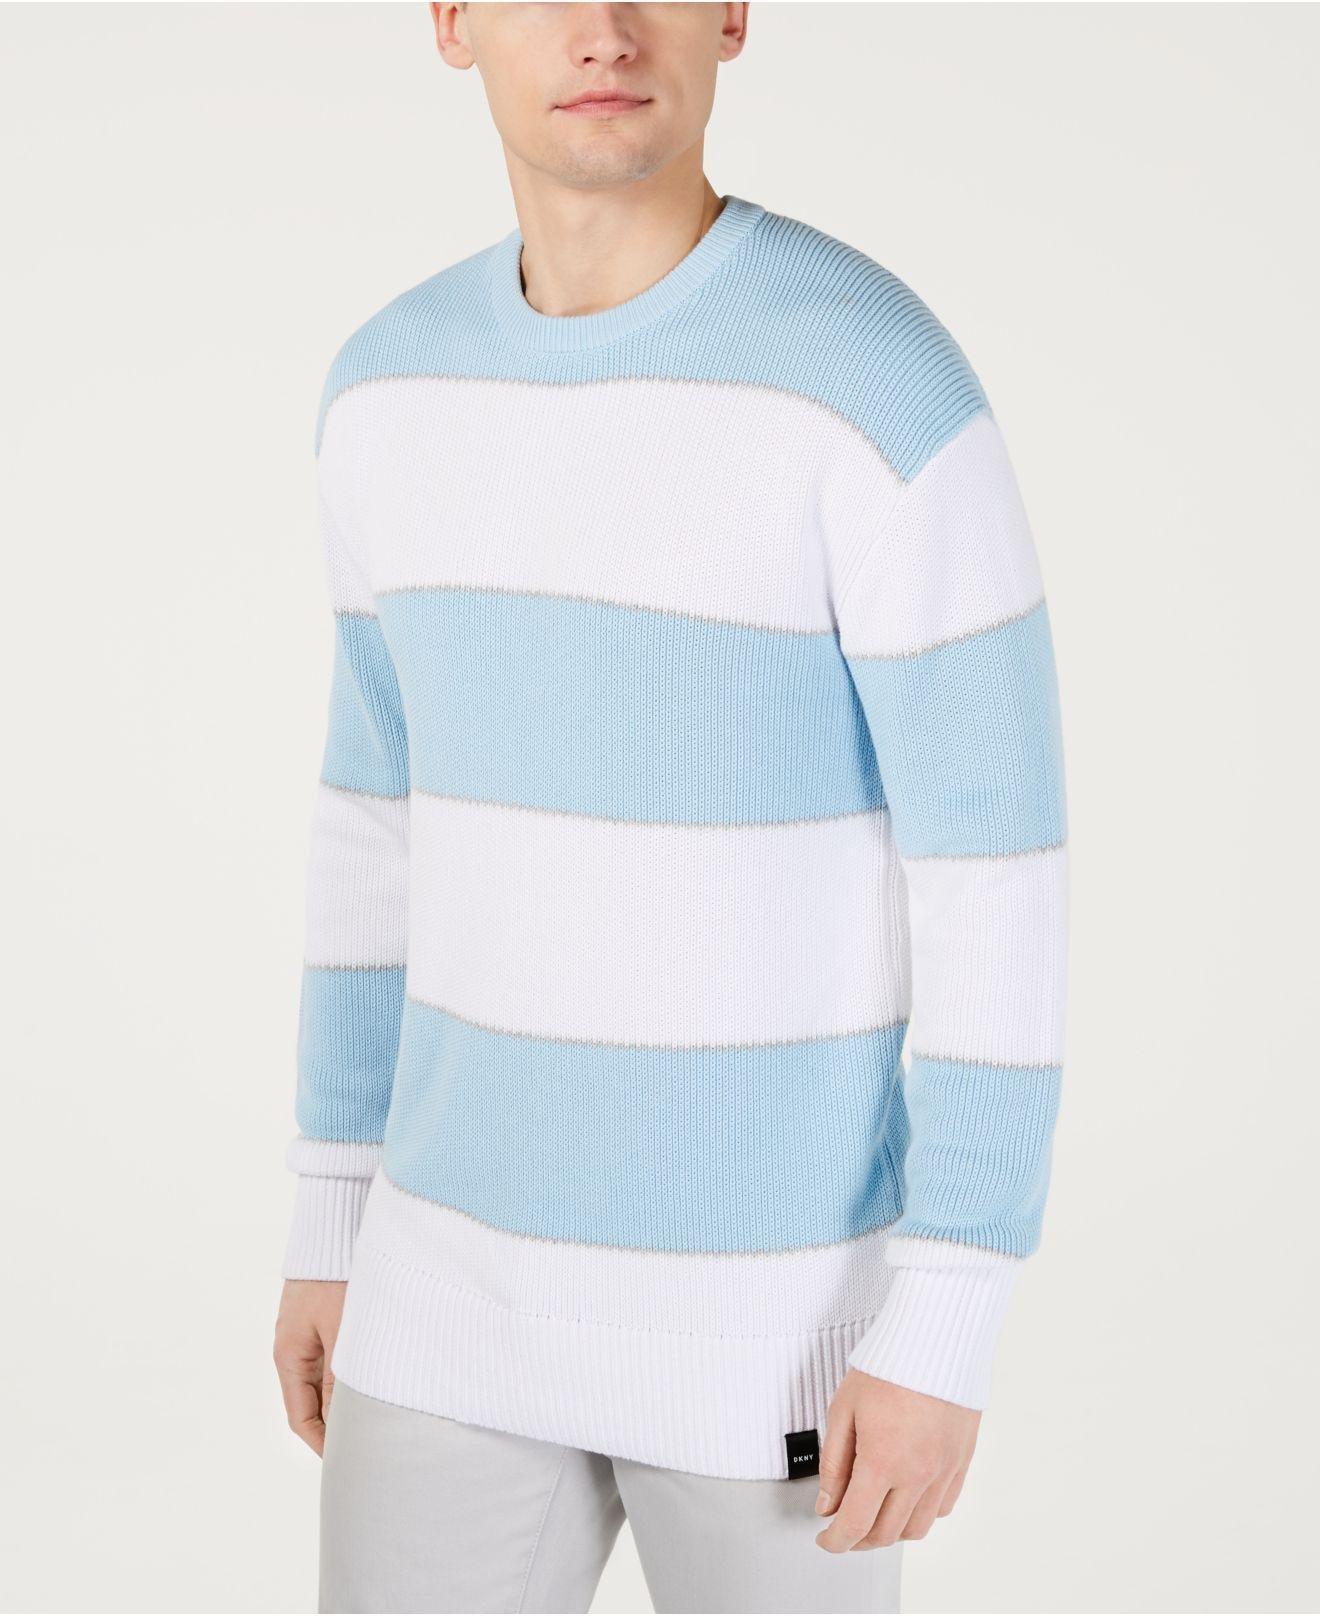 72e91ca86 DKNY - Blue Ombré Rugby Stripe Sweater for Men - Lyst. View fullscreen